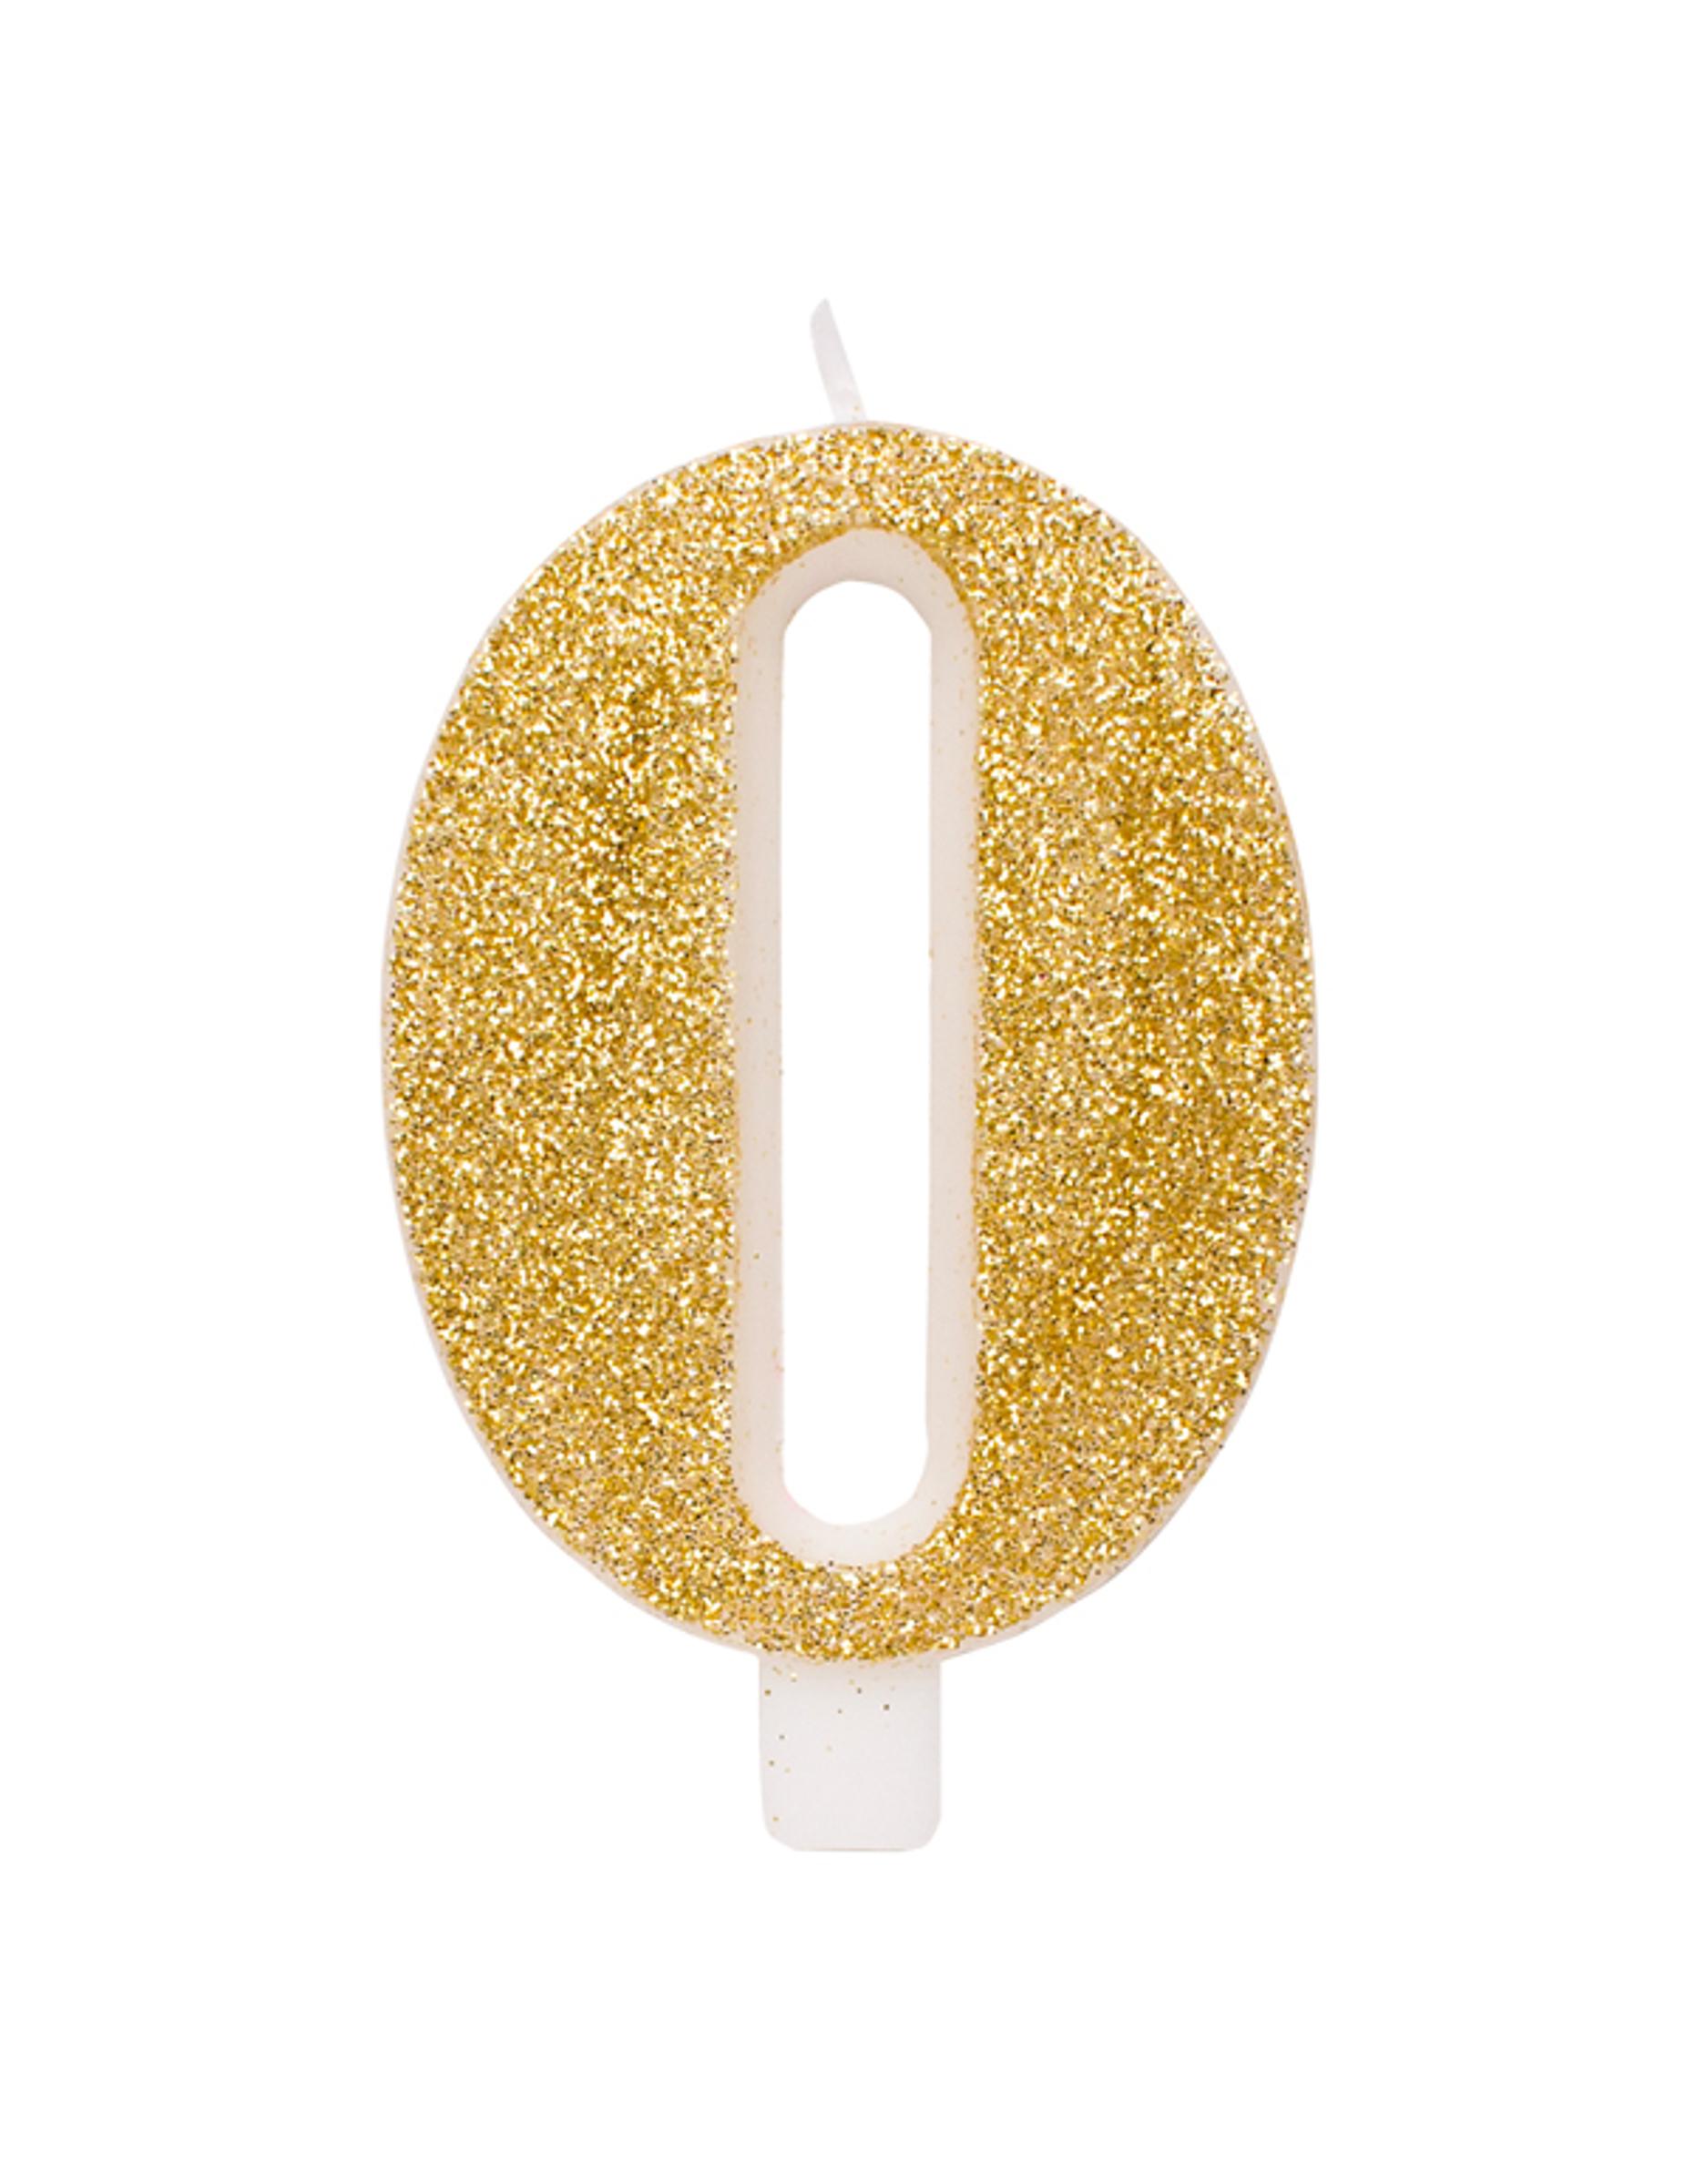 #Glitzernde Geburtstags-Kerze Zahl Kuchendeko goldfarben 9,5 cm#